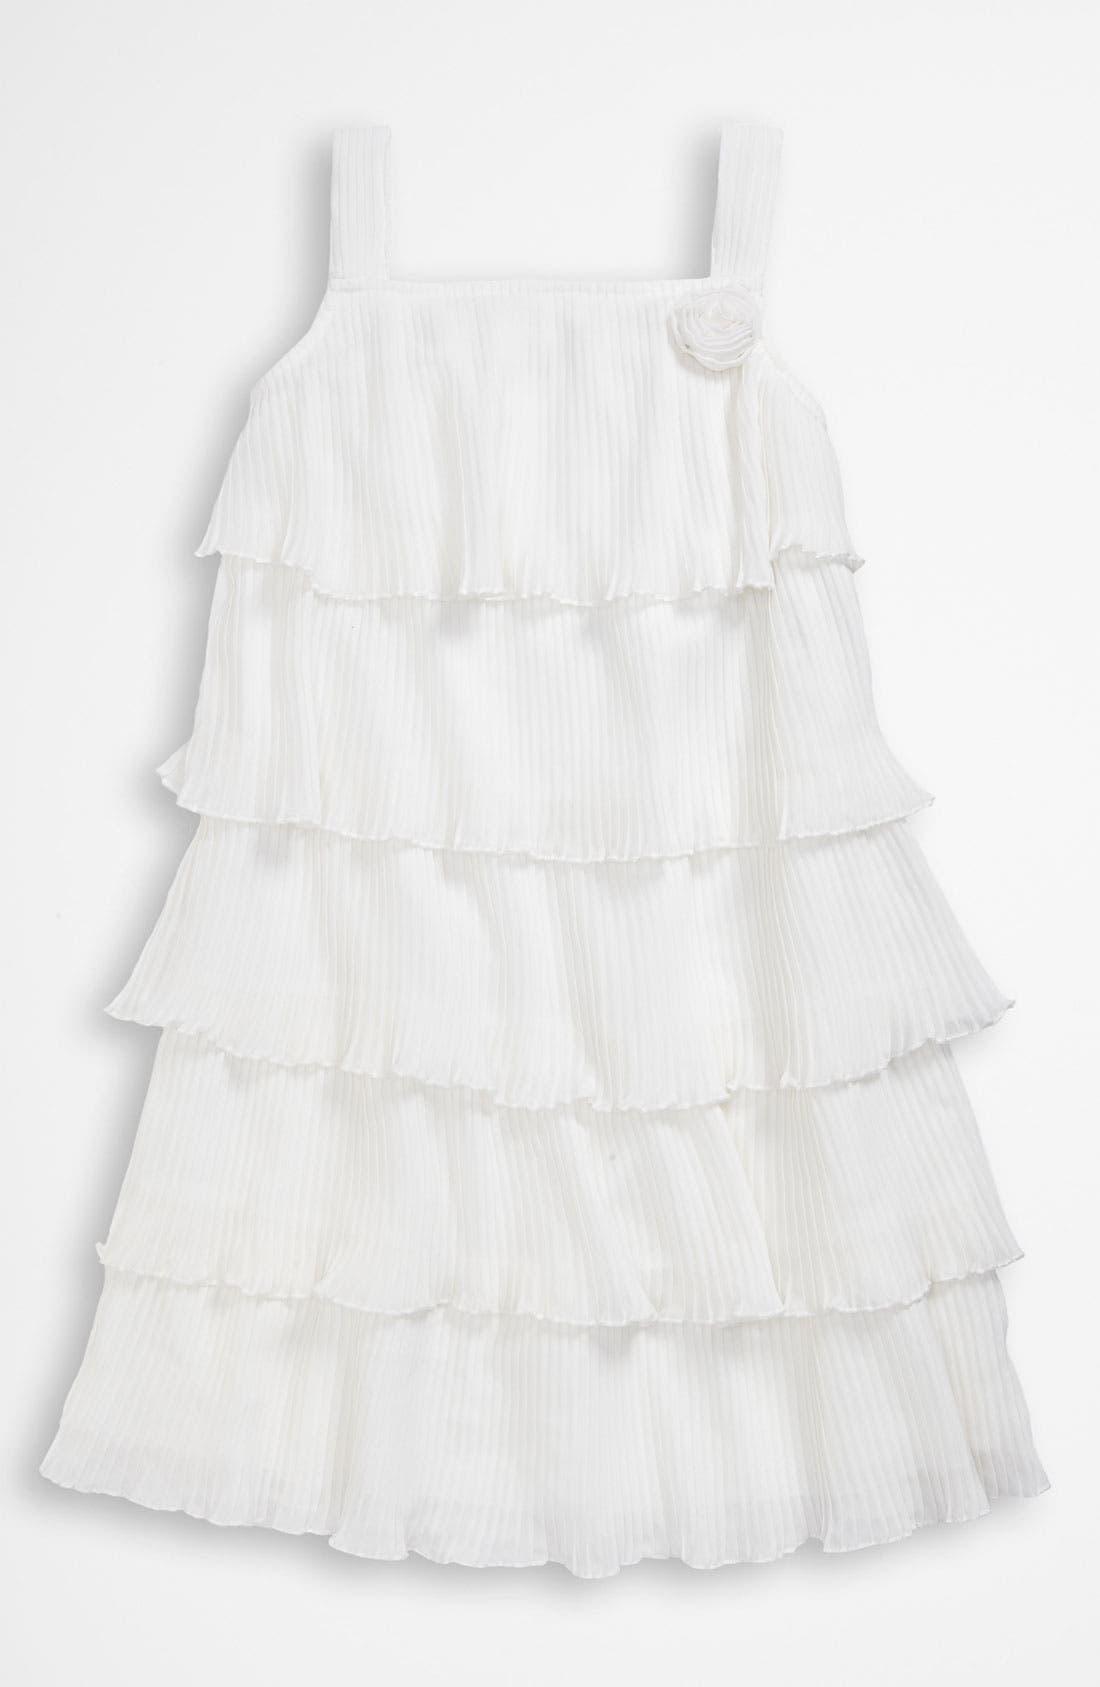 Main Image - United Colors of Benetton Kids Ruffle Dress (Little Girls & Big Girls)